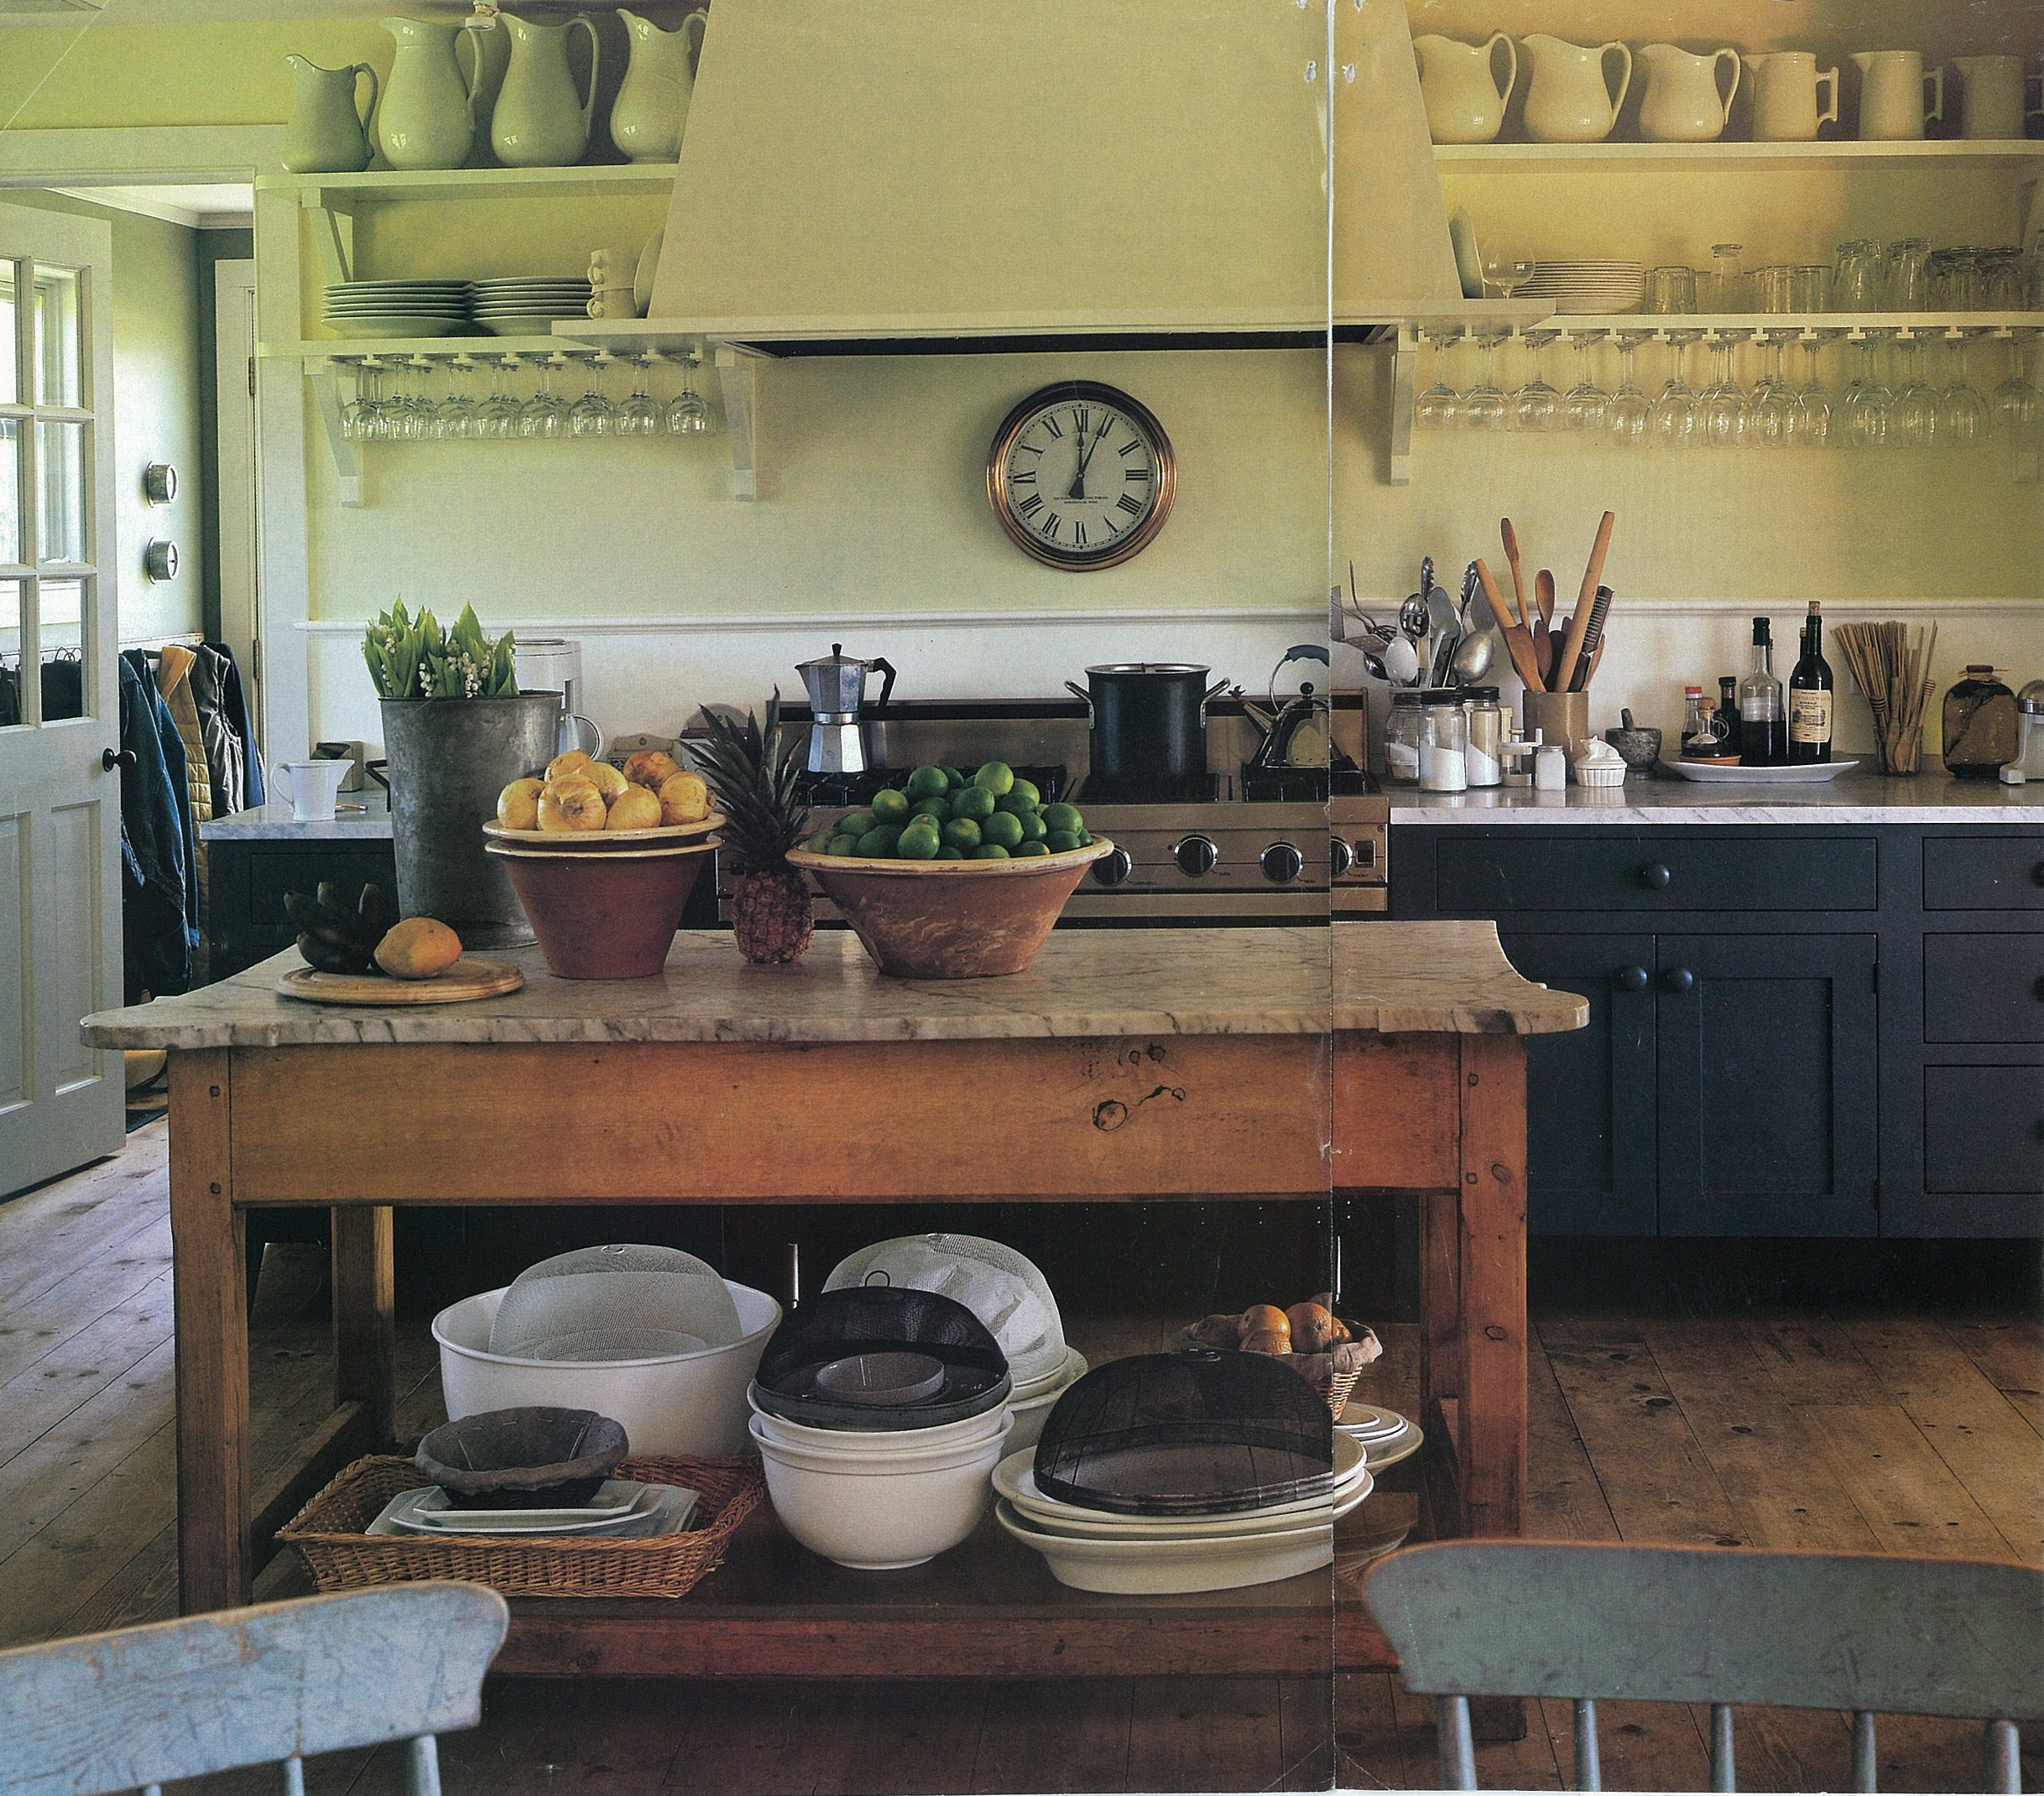 Kitchen No Cabinets: Peri Wolfman Style On Pinterest